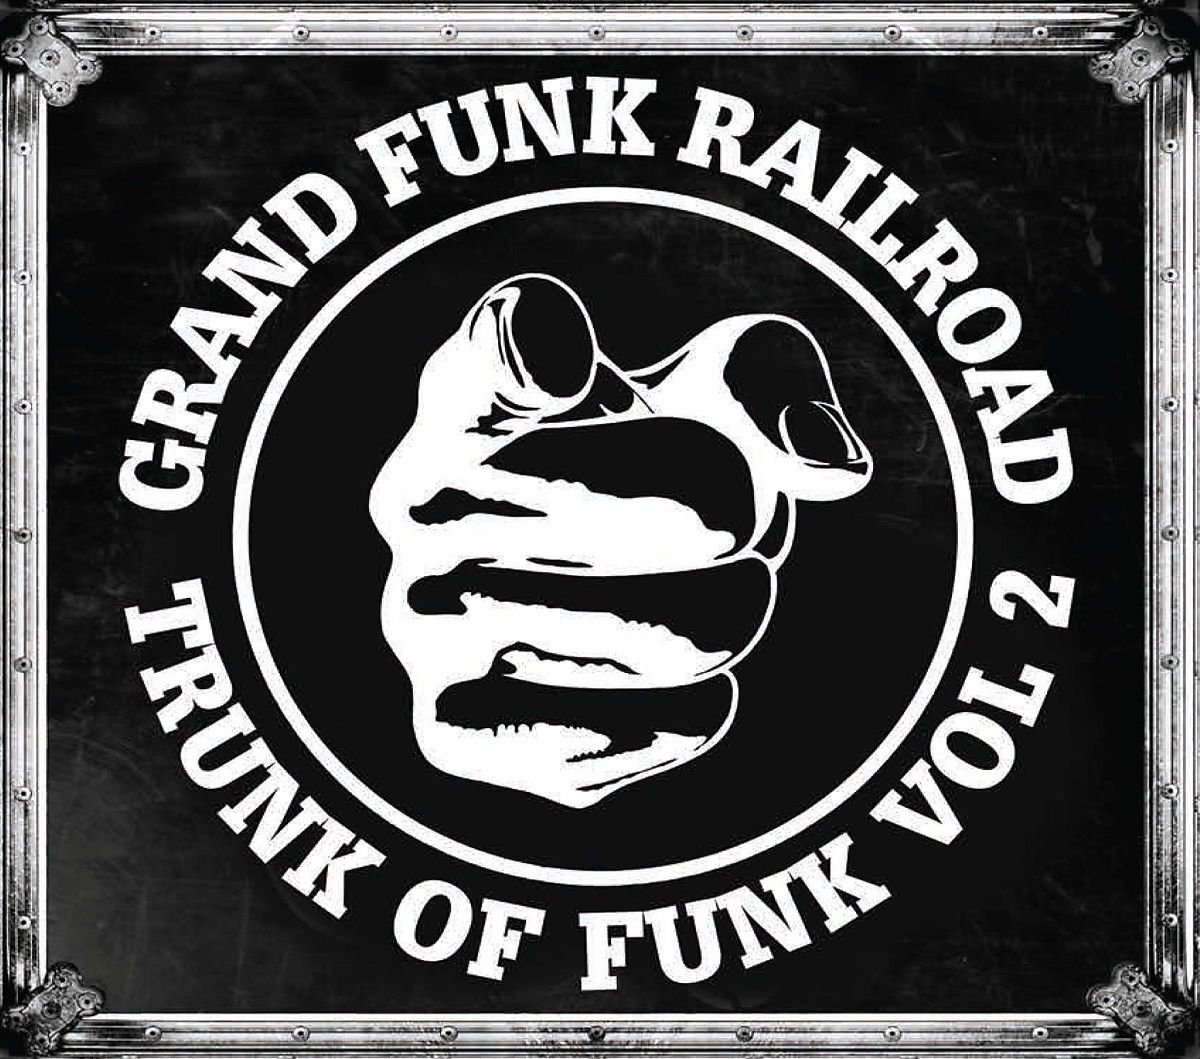 Trunk of Funk,Vol.2 (6cd Box)